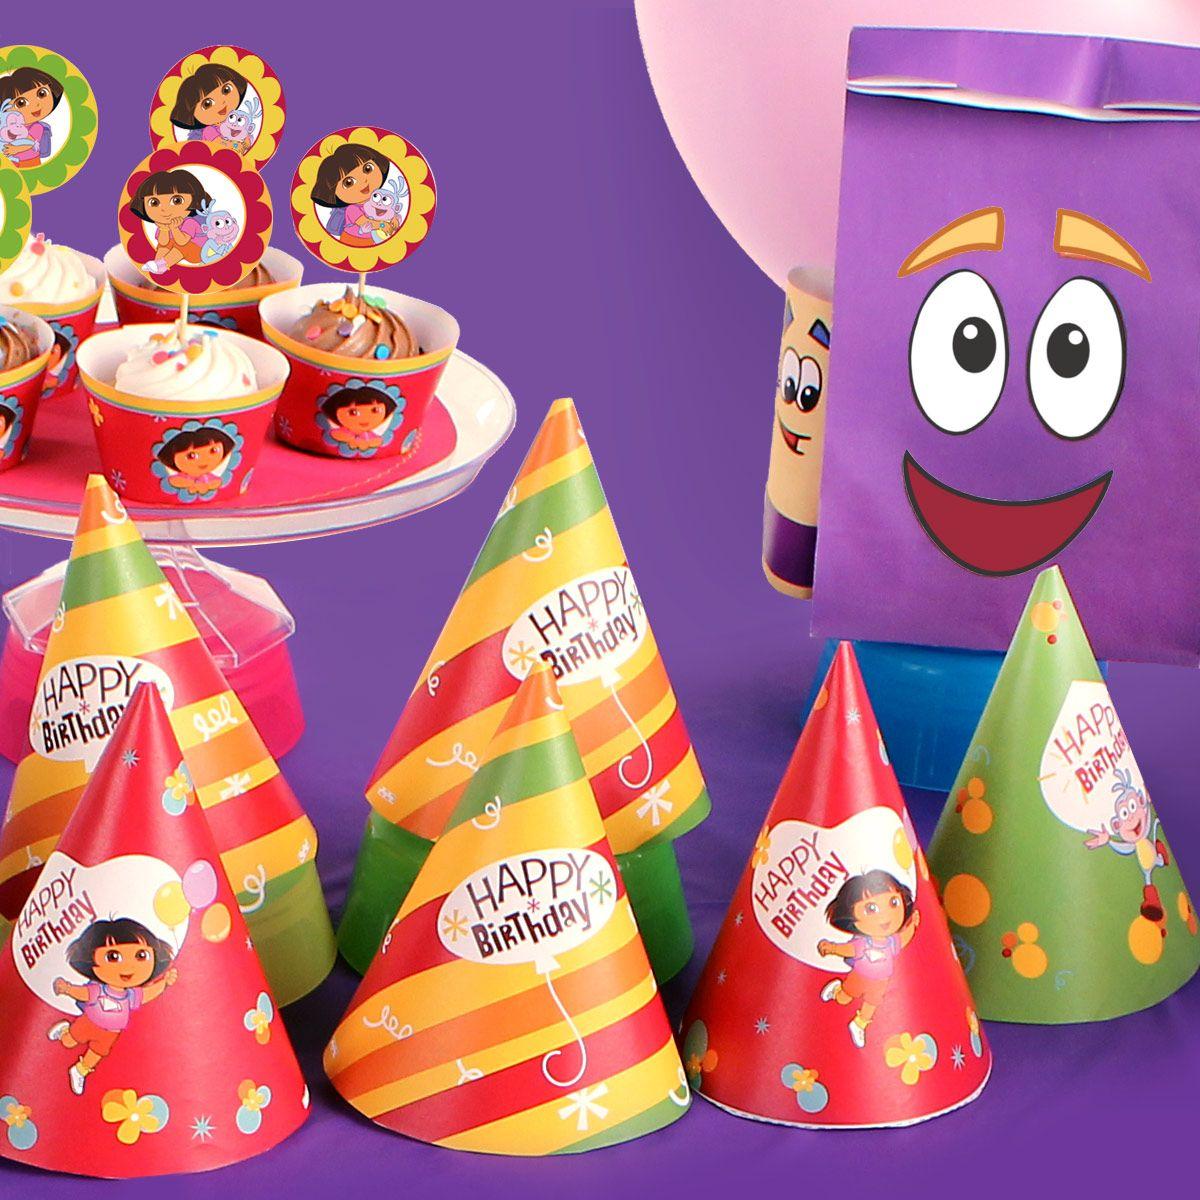 Dora Birthday Party Day Planner Birthdays Bday party ideas and